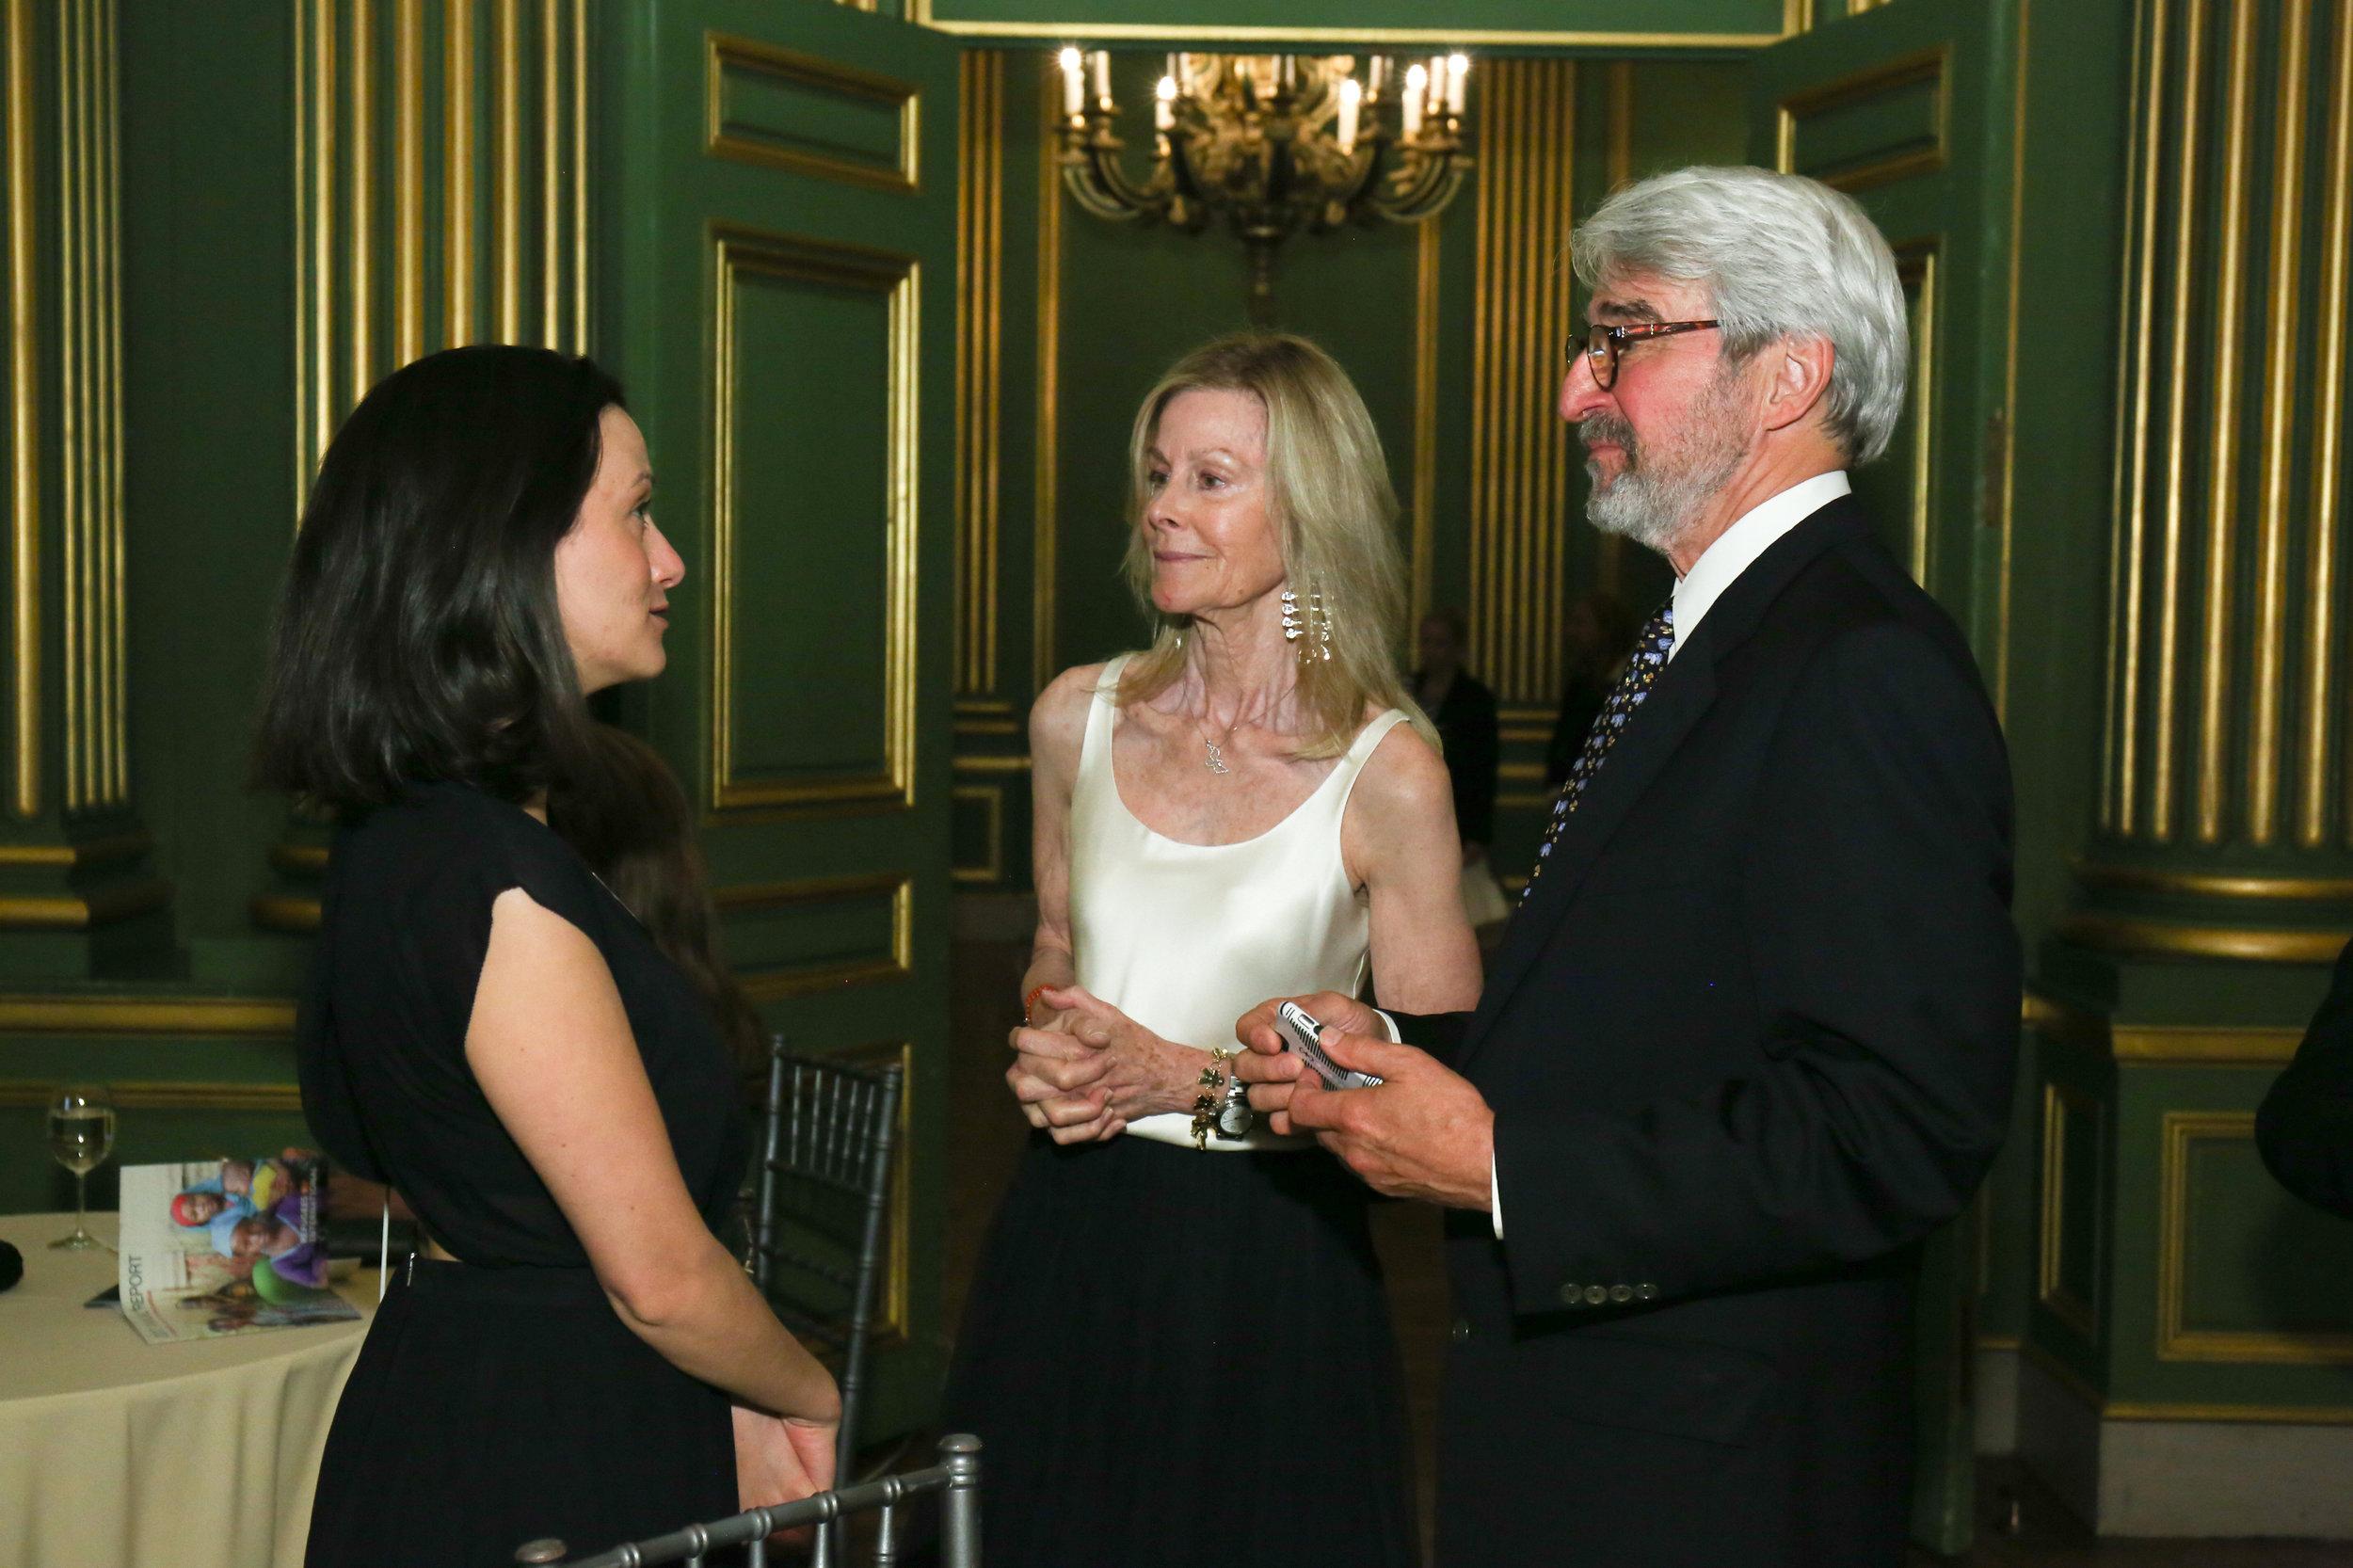 RI Advocate Alexandra Lamarche with Board Chair Eileen Shields-West and Board Member Emeritus Sam Waterston.